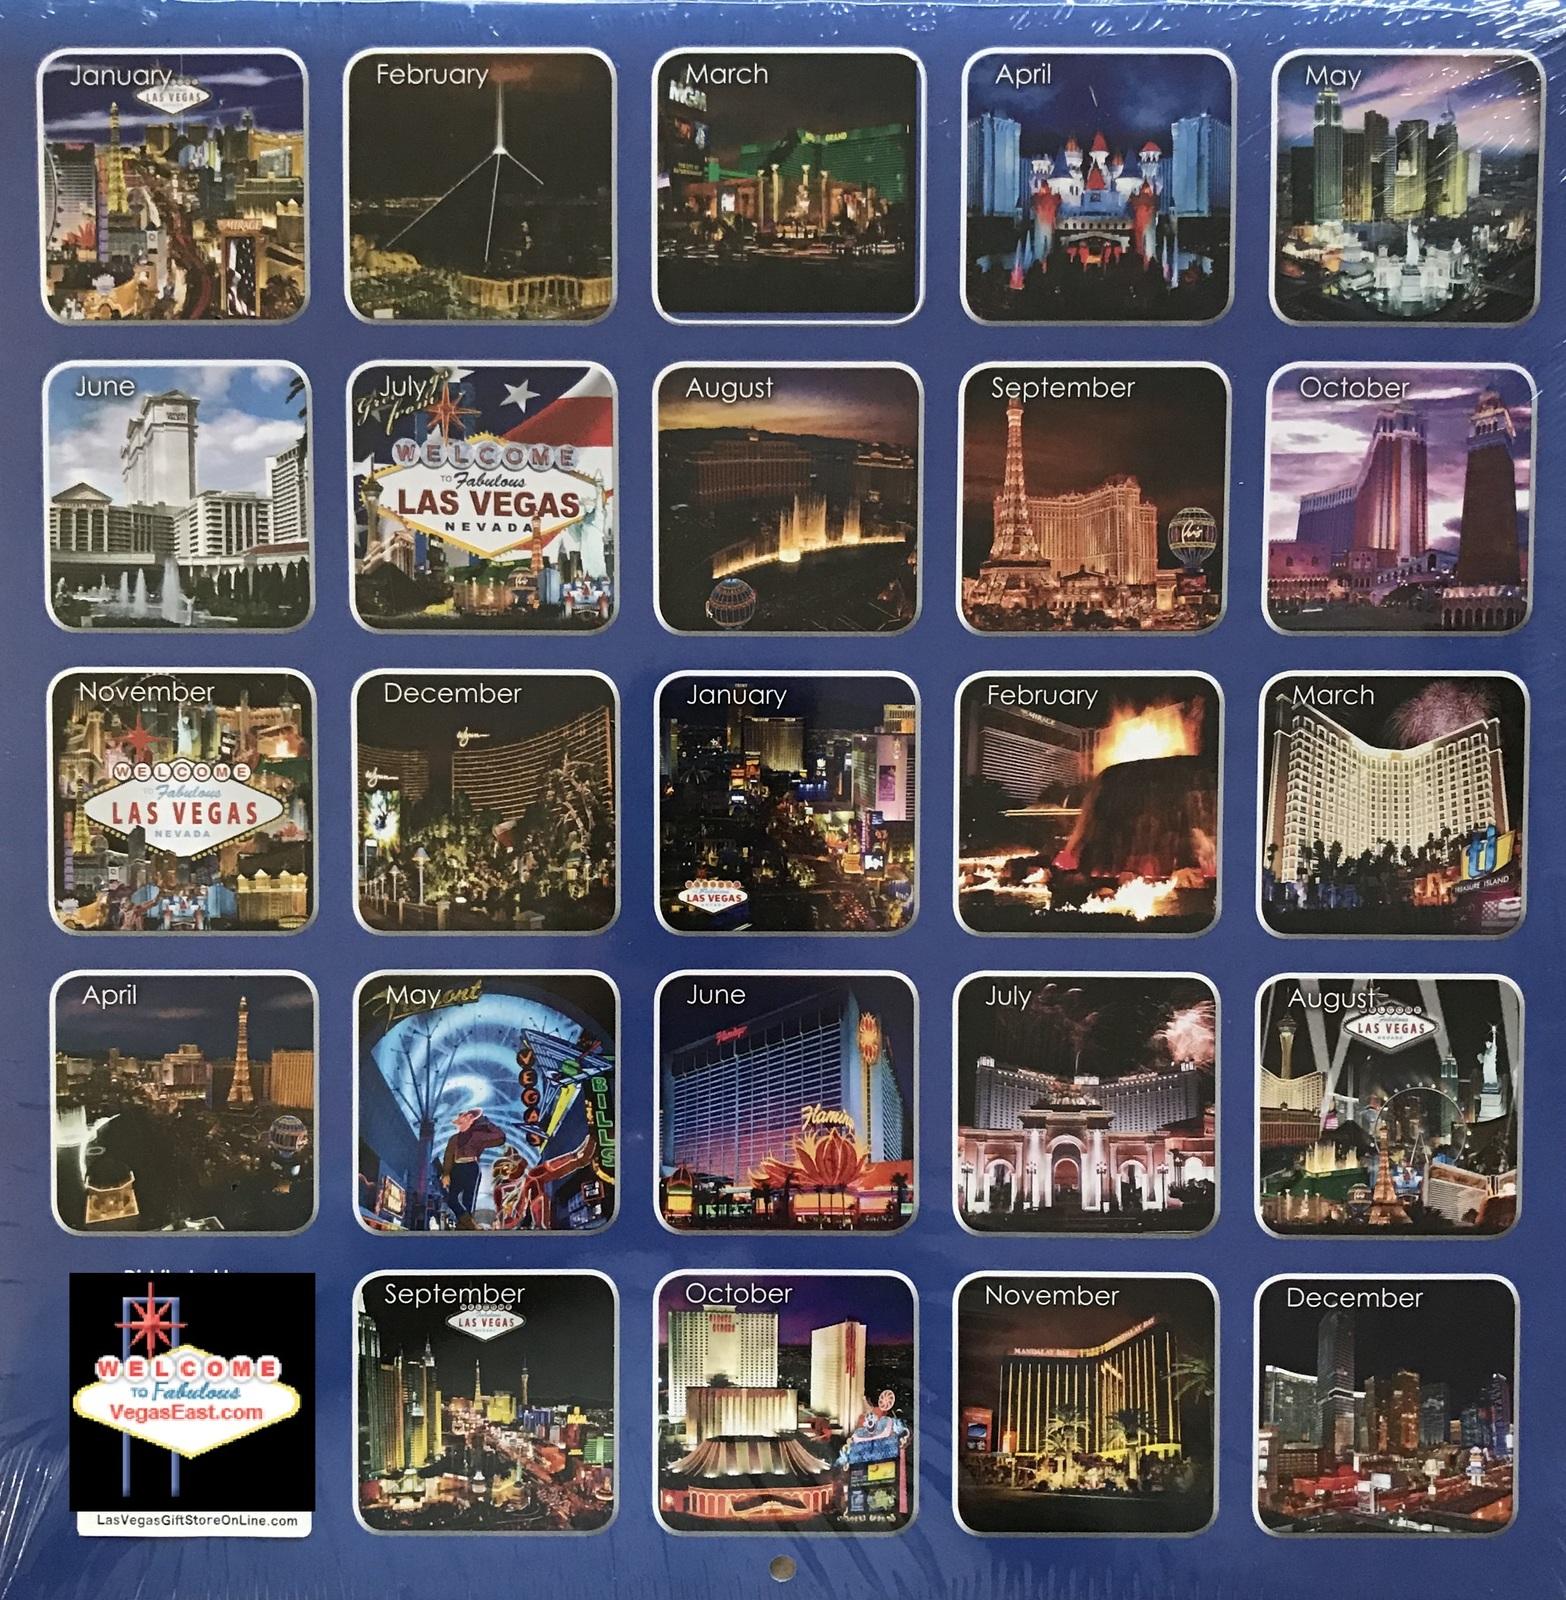 Las Vegas Calendar 2022.2021 2022 24 Month 2 Year Las Vegas Wall And 9 Similar Items